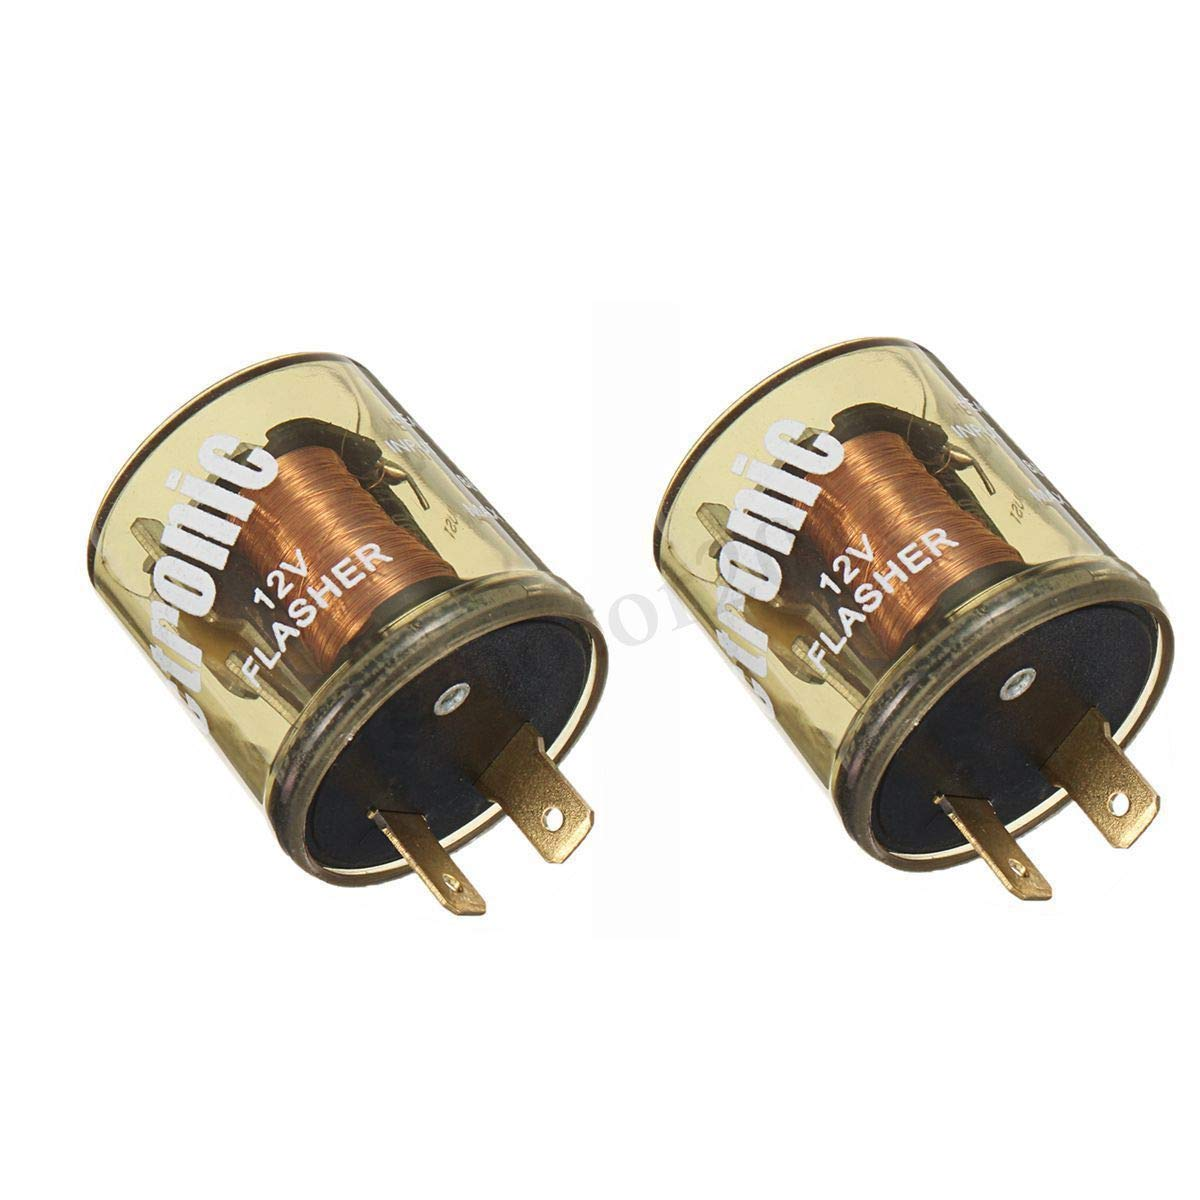 Bussmann NO.535 5.2 Amp Thermal Flasher